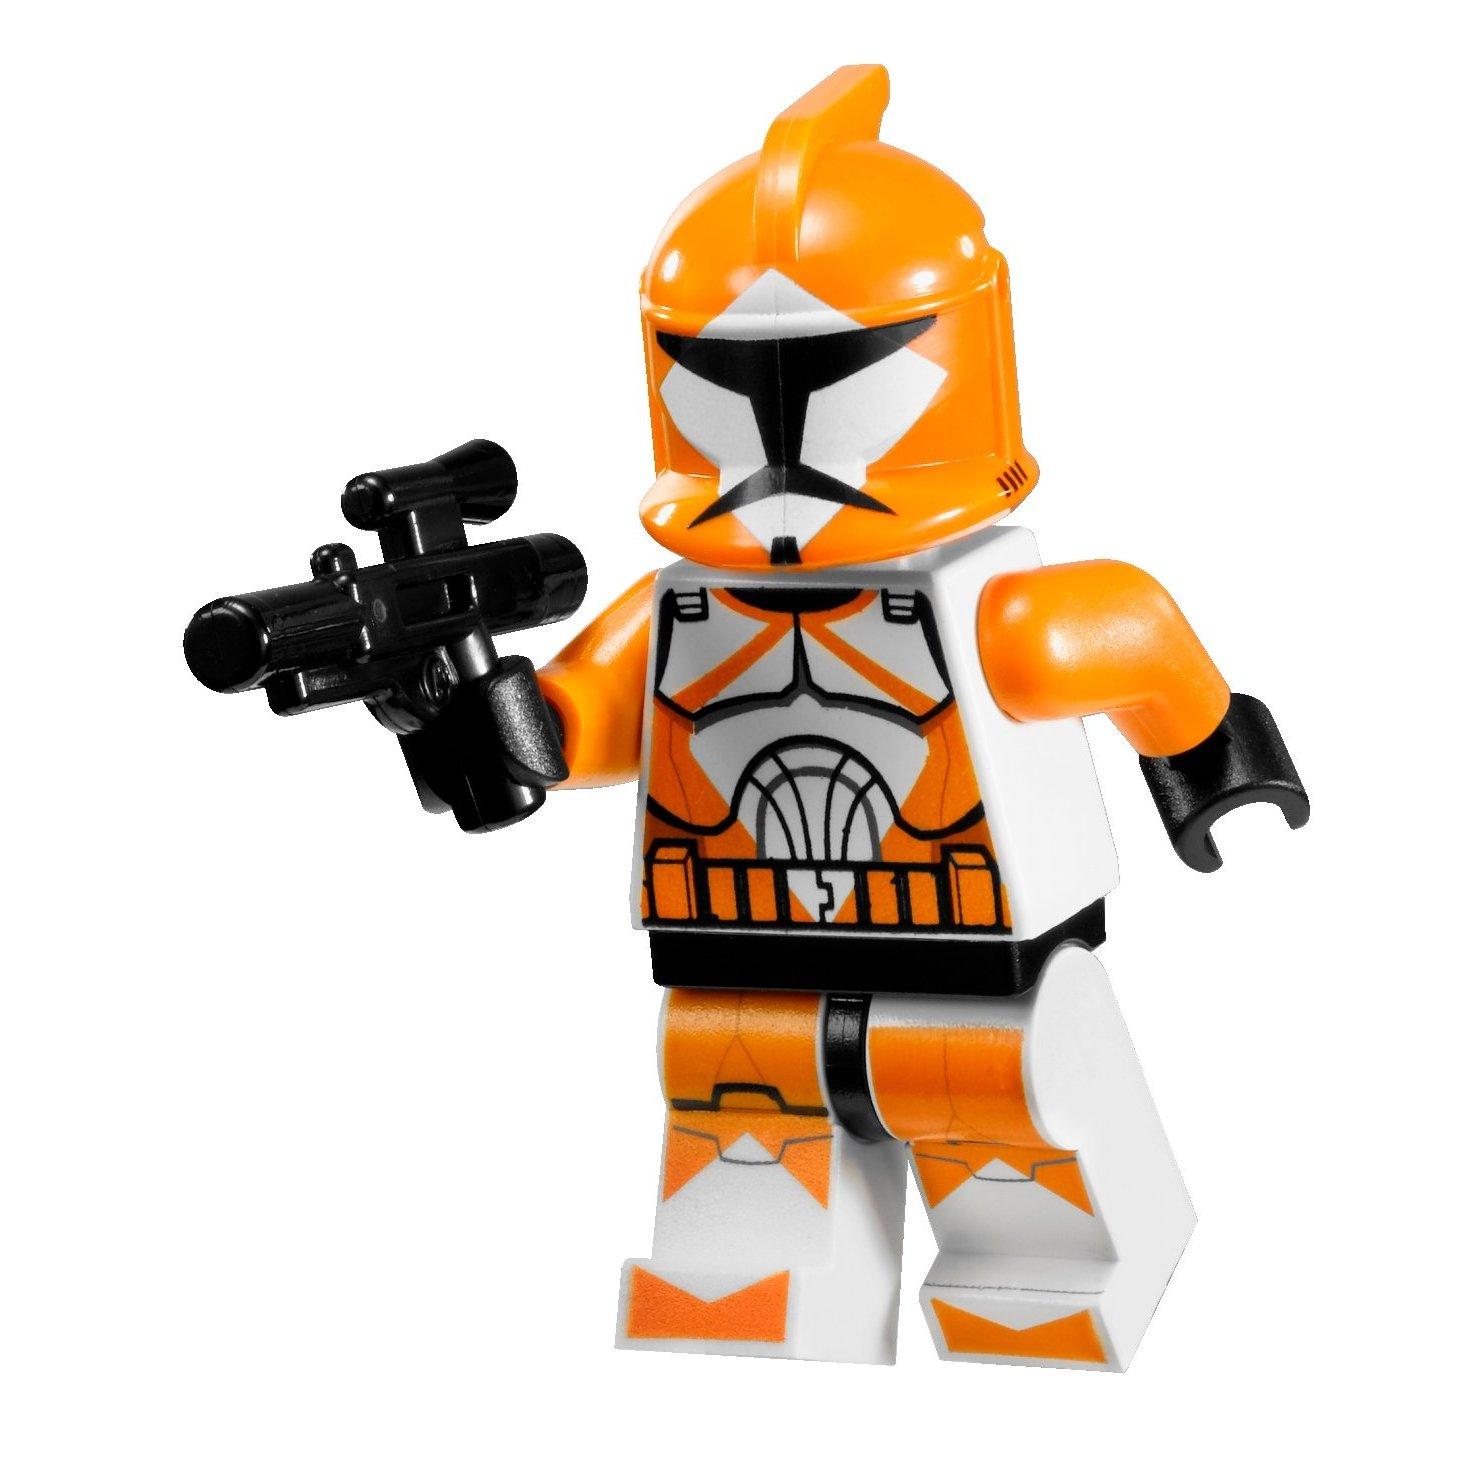 Lego star wars clipart 2